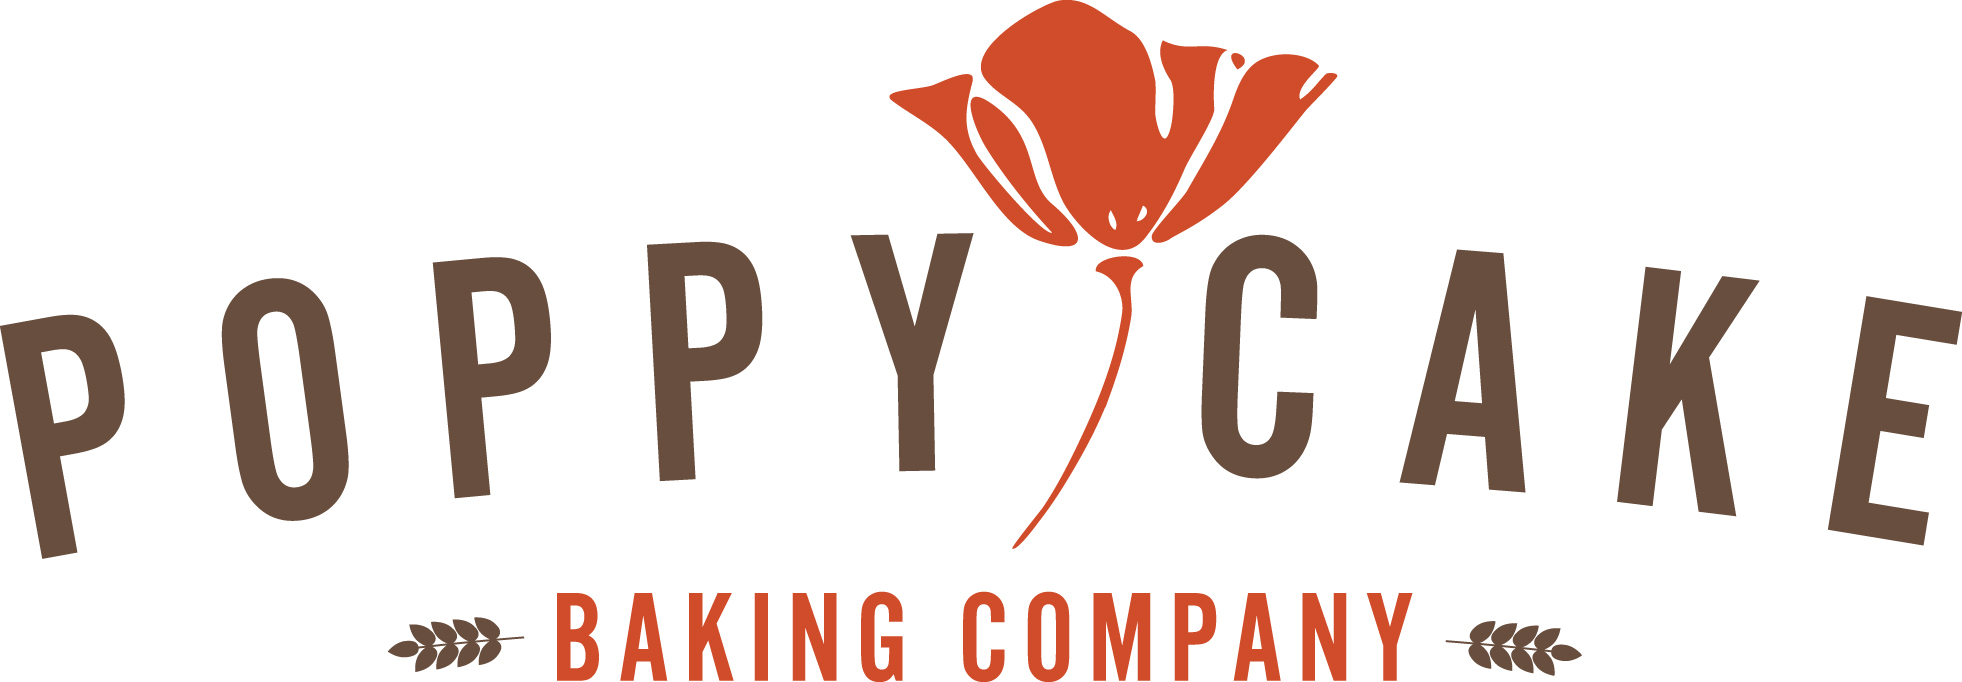 Poppy Cake Baking Copany)